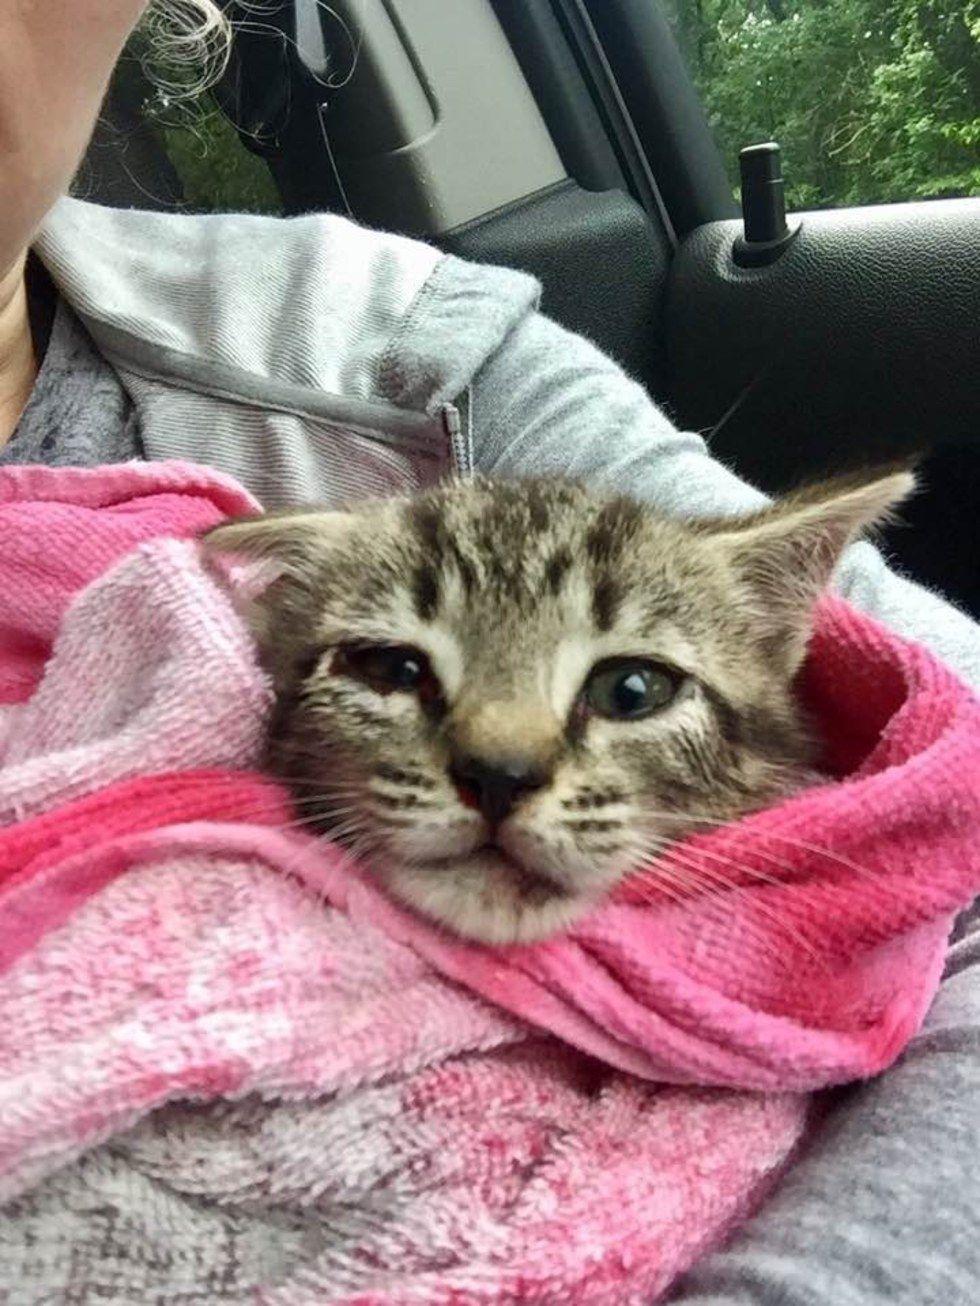 Woman Saves Kitten Lying On Highway Despite Getting A Ticket Kitten Little Kittens Tabby Kitten